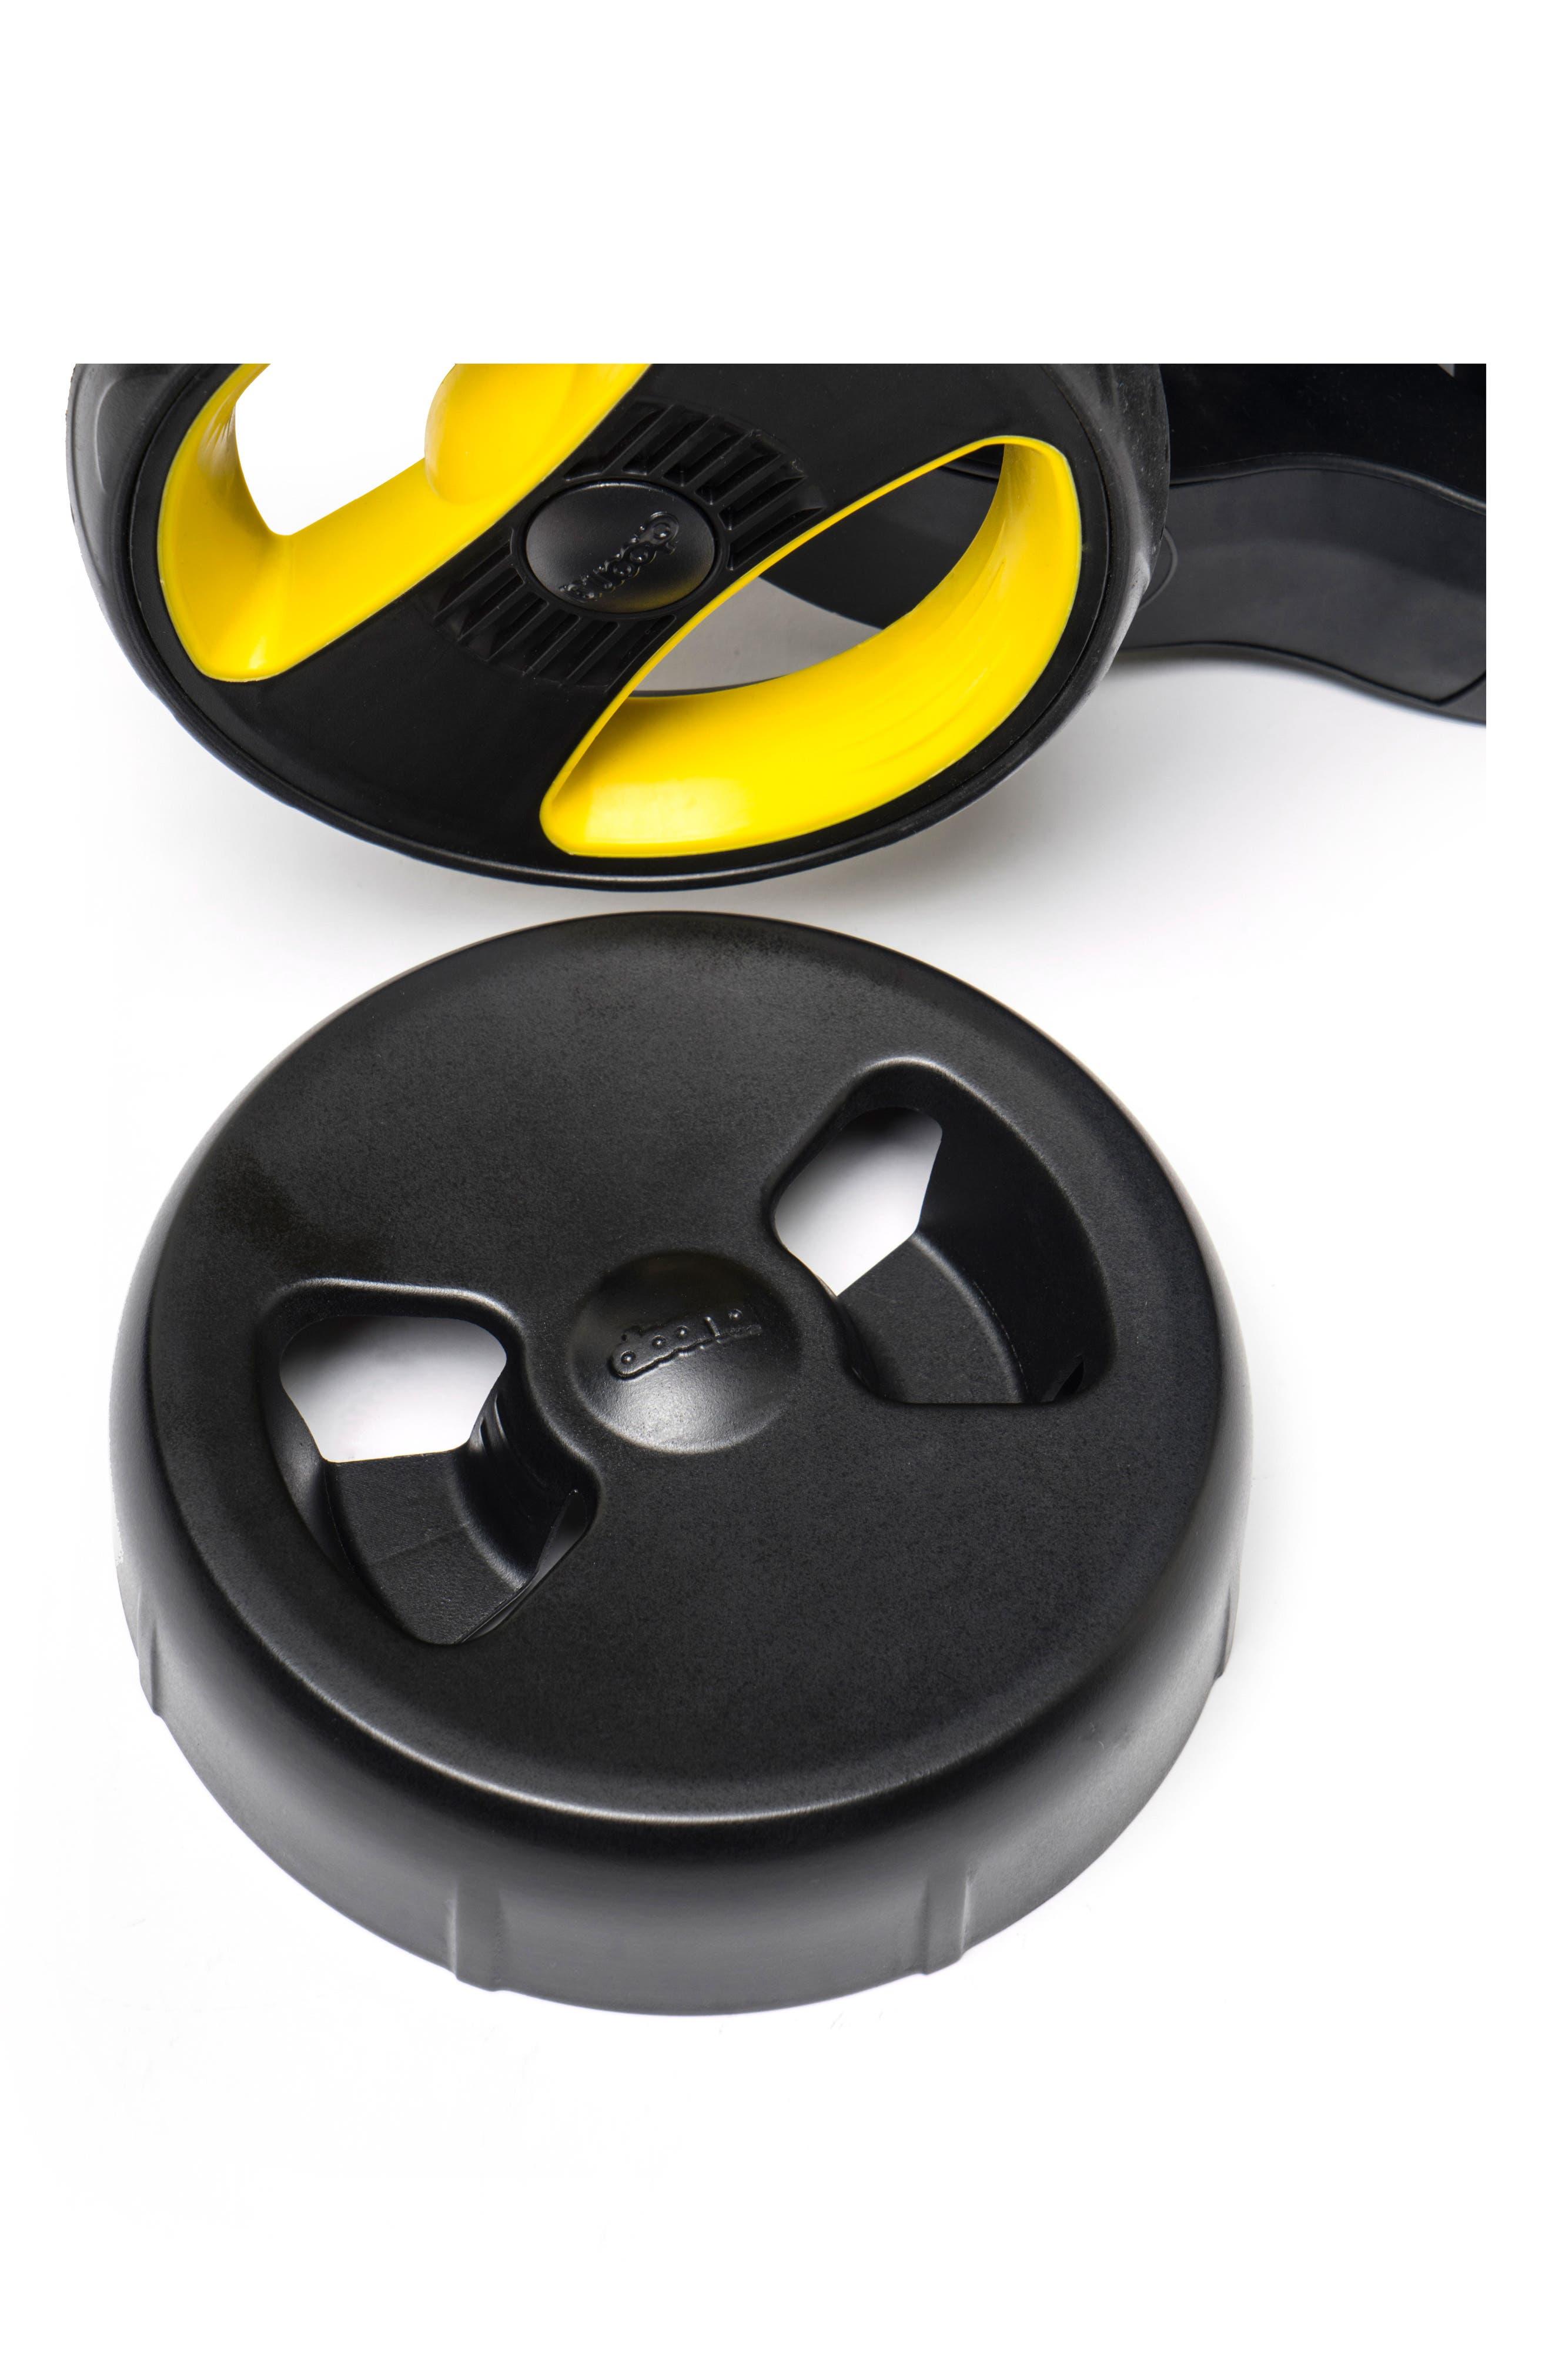 Wheel Covers,                             Main thumbnail 1, color,                             Black